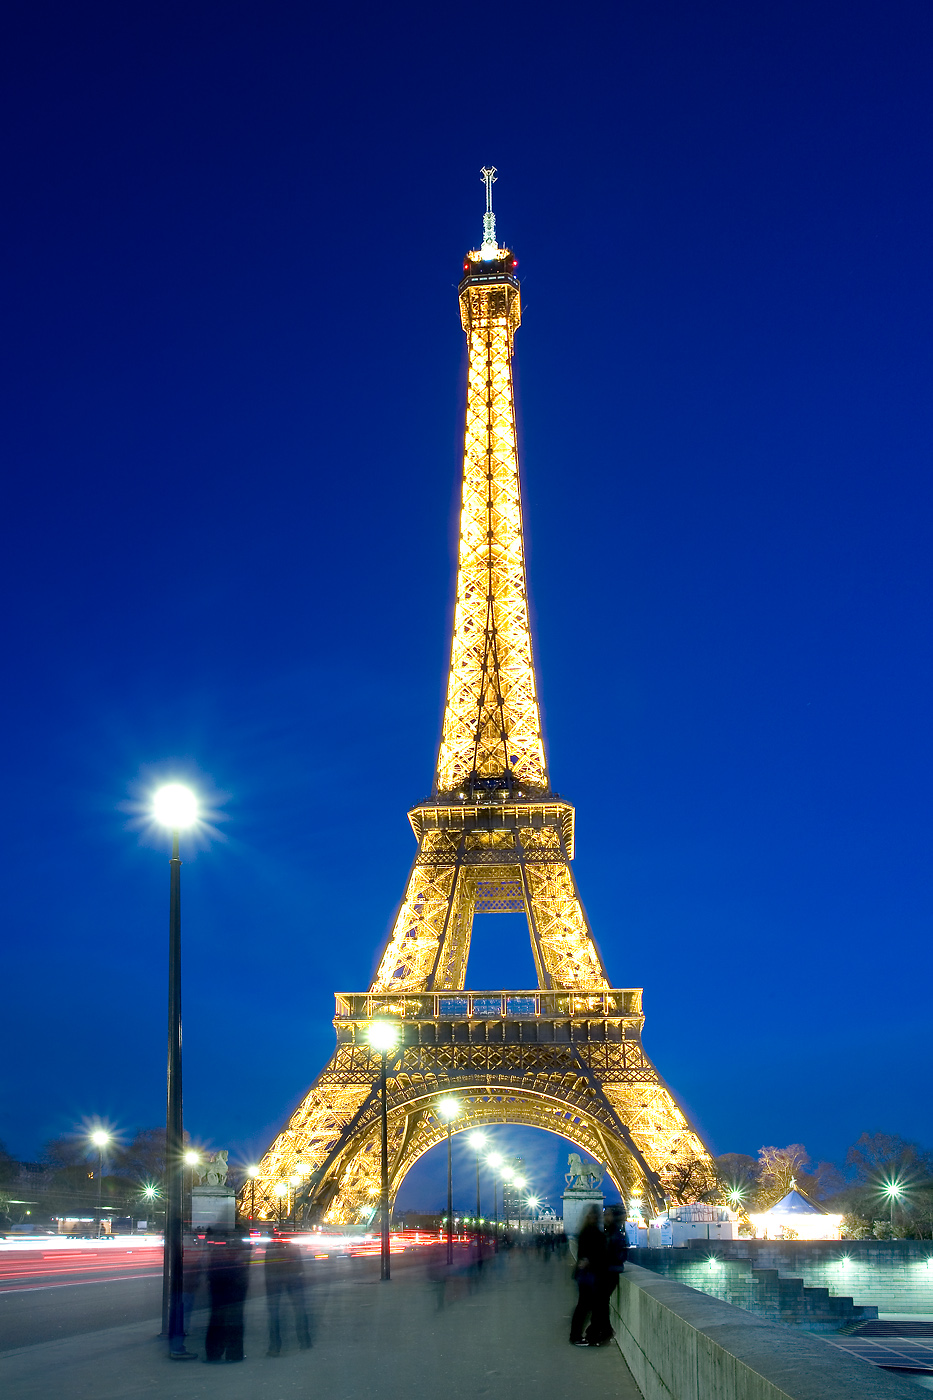 Eiffel Tower Hd Wallpapers 933x1400